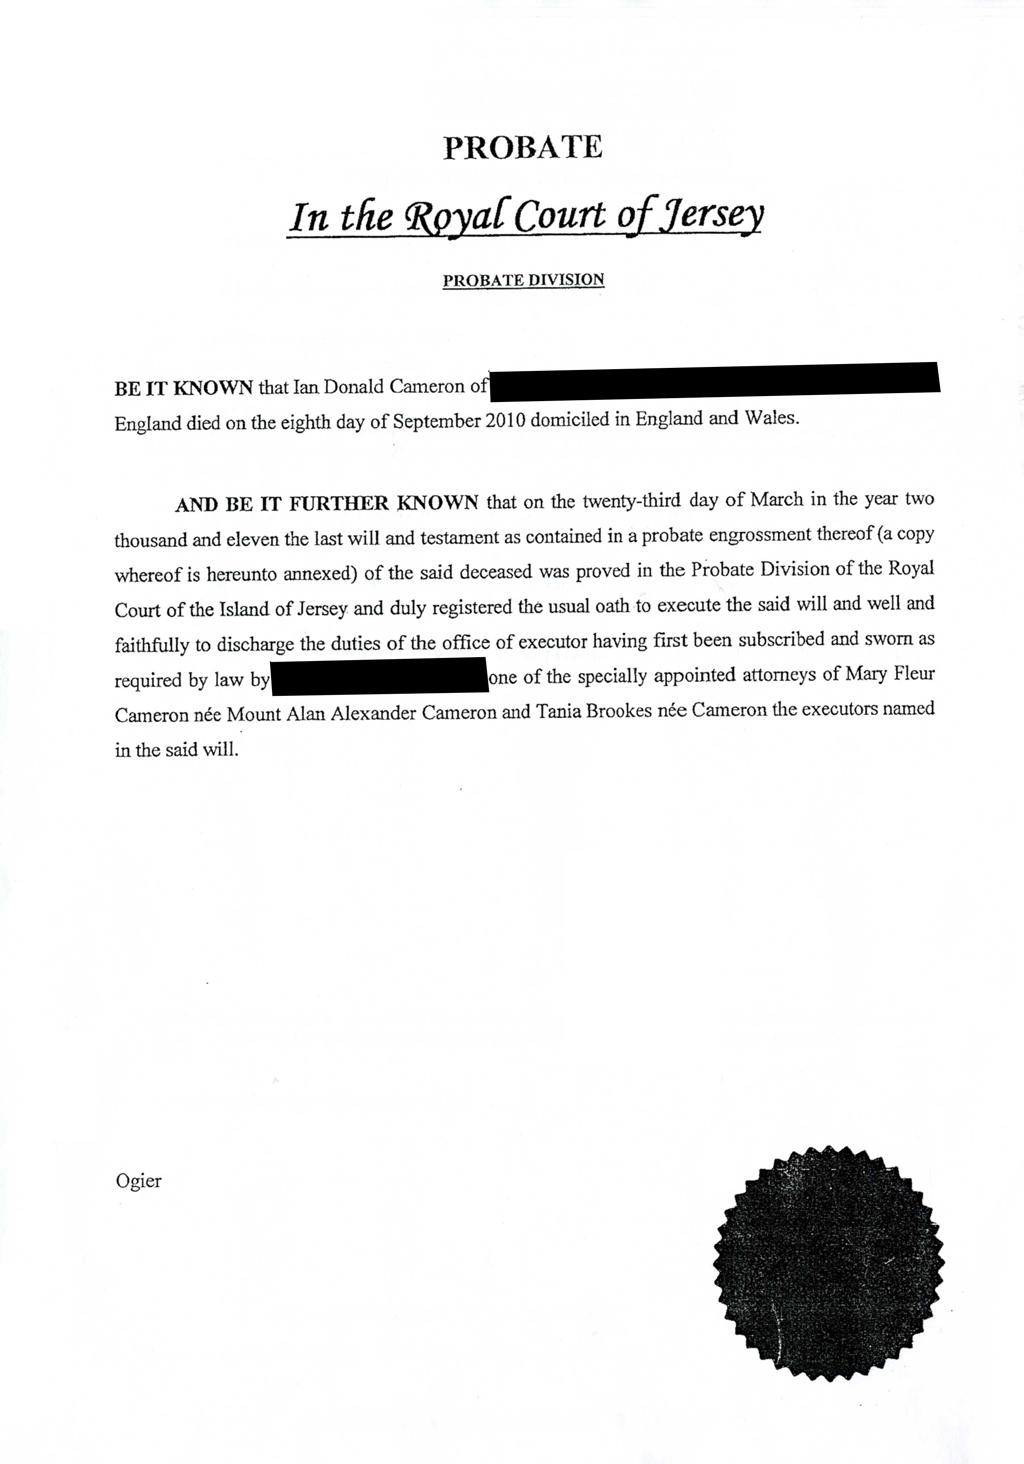 Probate document